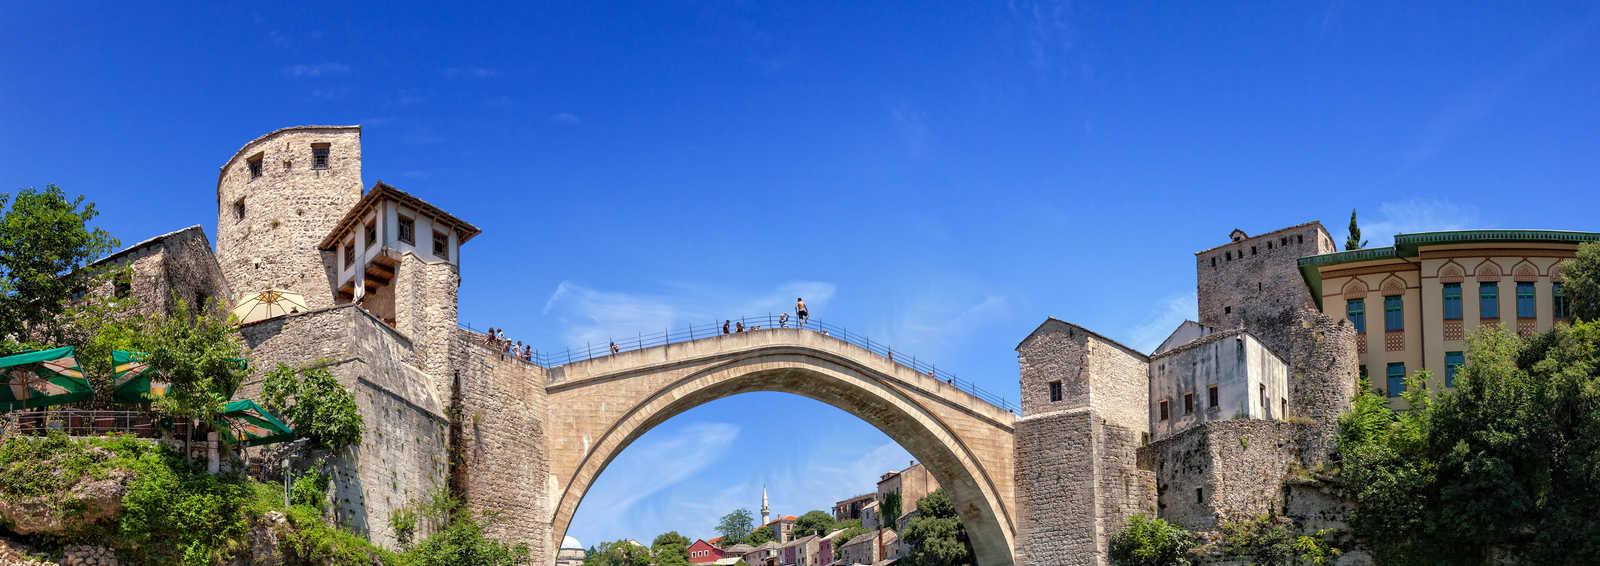 Stari Most, Mostar, Bosnia & Herzegvina